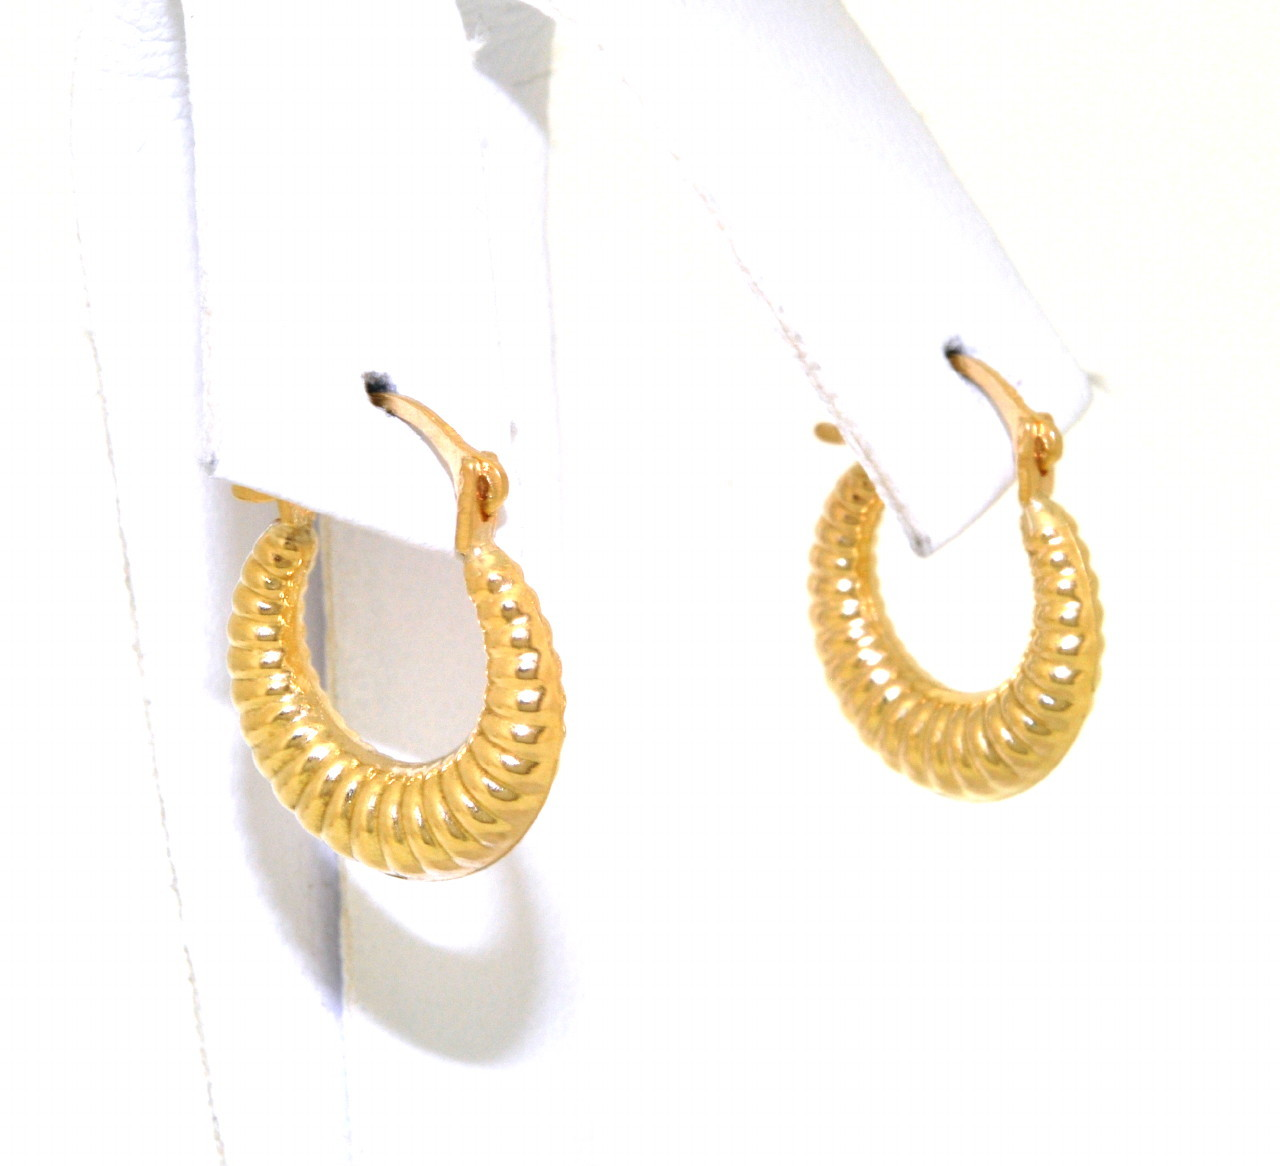 Shin Brothers Jewelers Inc 14k Yellow Gold Shrimp Hoop Earrings